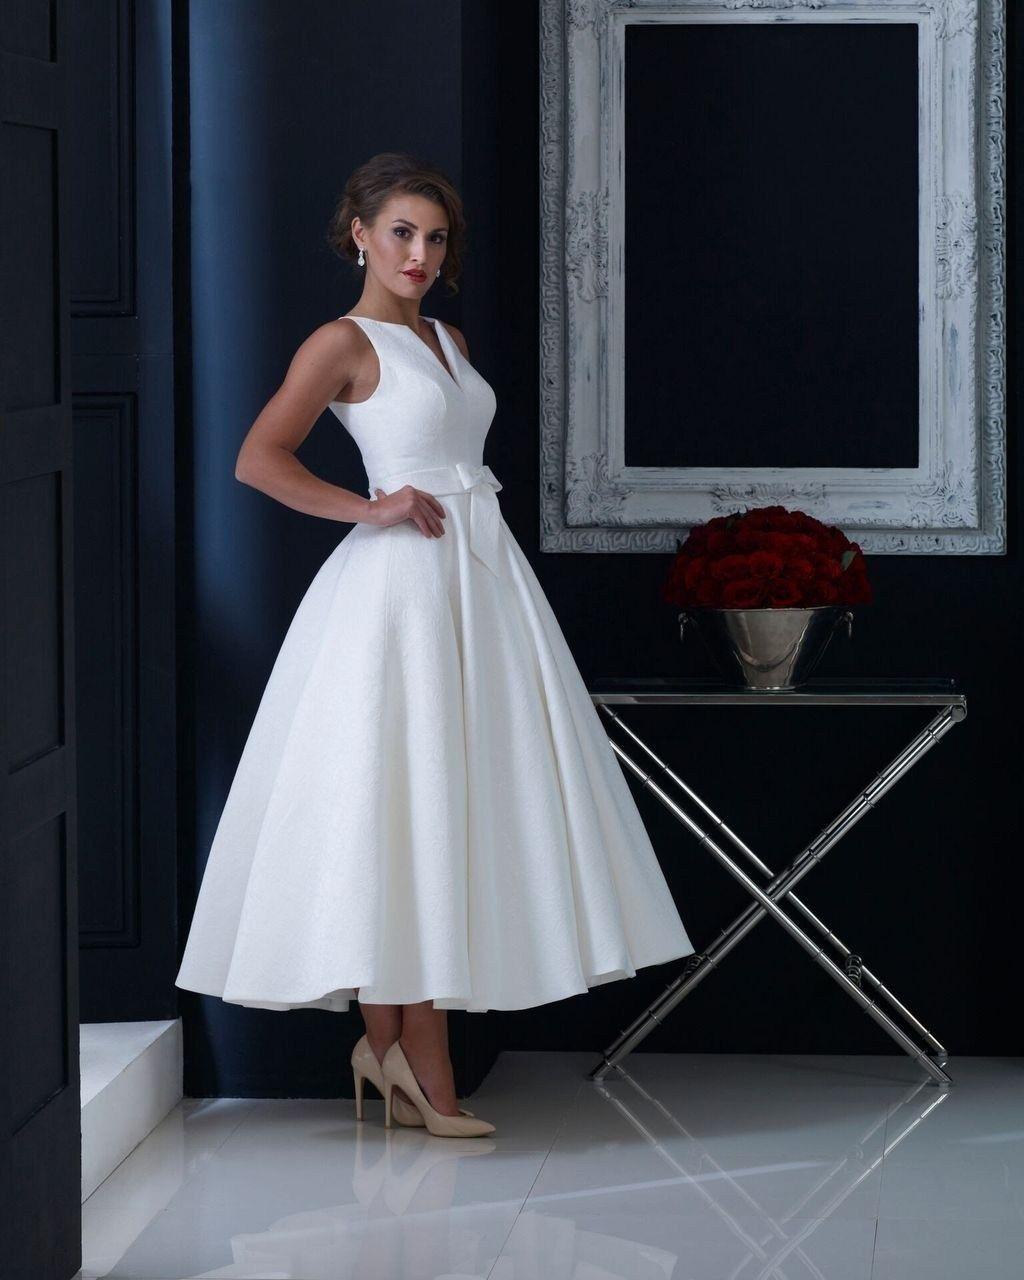 45 Gorgeous Tea Length Wedding Dresses Ideas Addicfashion Tea Length Wedding Dress Vintage Short Wedding Dress Tea Length Wedding Dress [ 1280 x 1024 Pixel ]